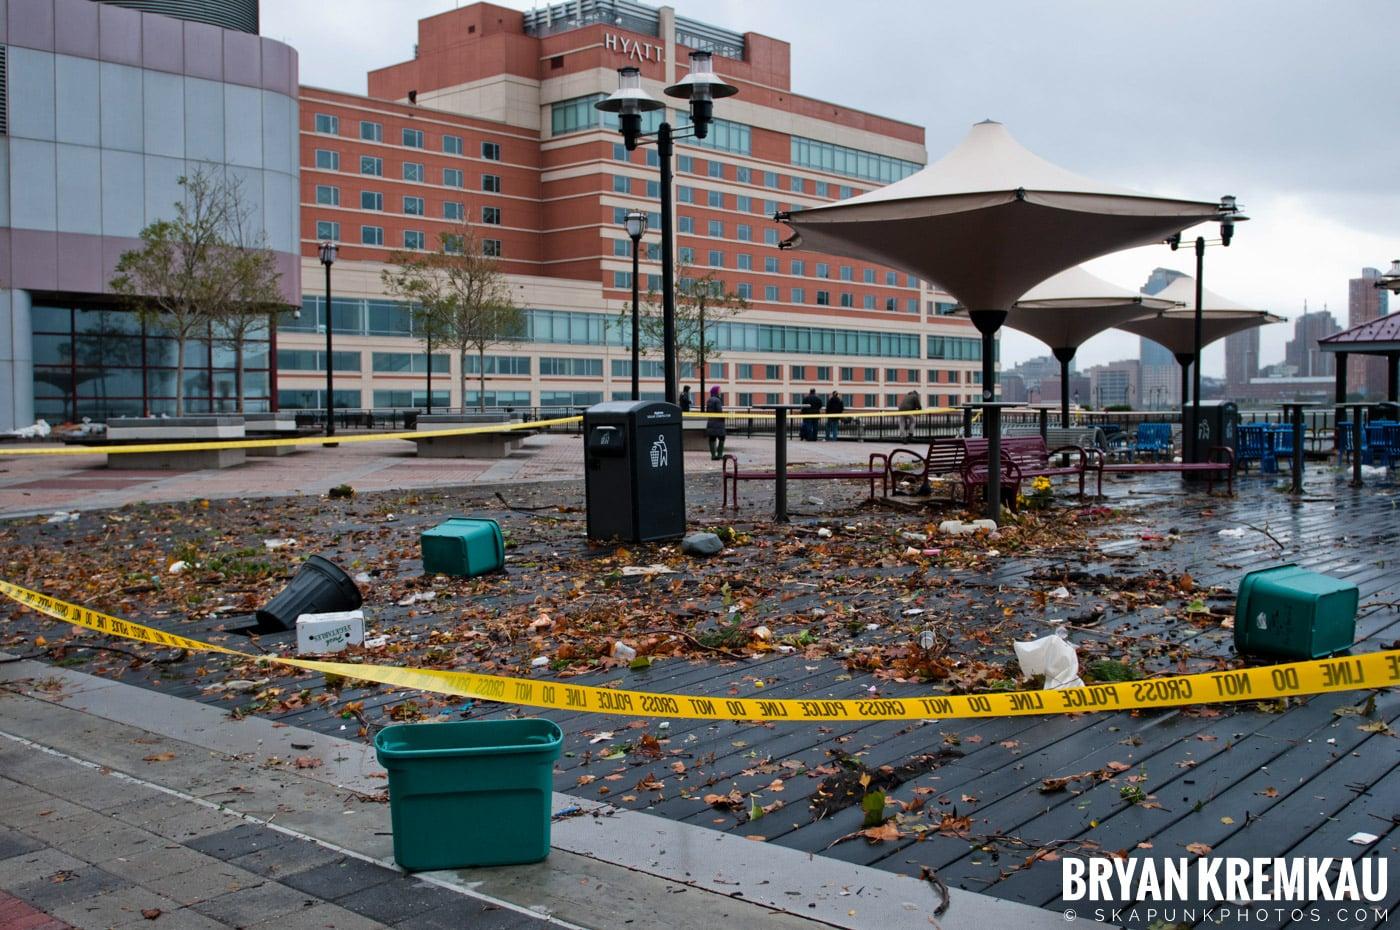 Hurricane Sandy 2012 @ Paulus Hook, Jersey City - 10.29.12 - 10.30.12 (7)